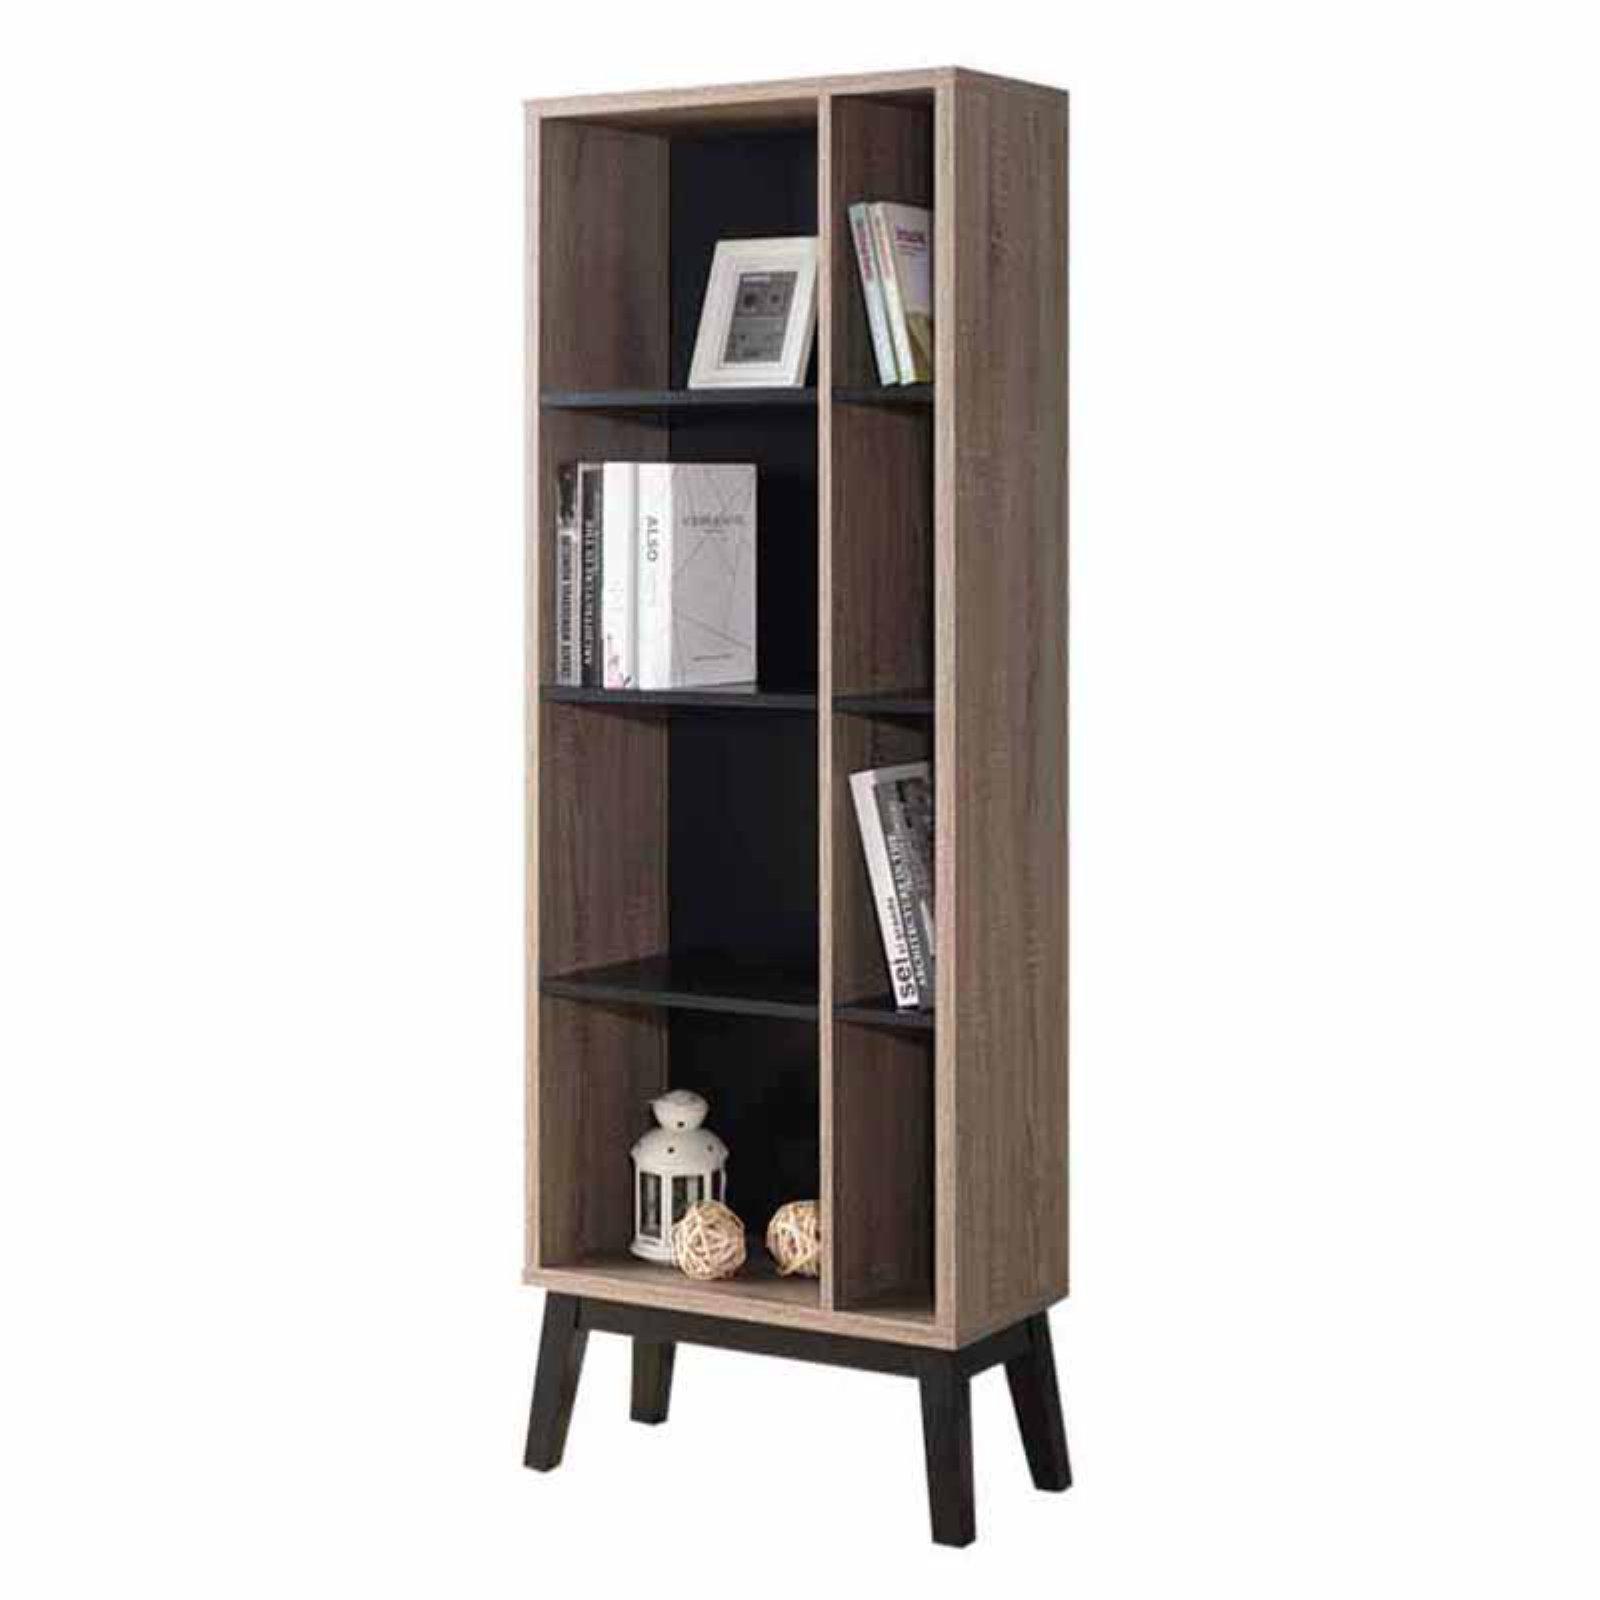 Benzara Narrow Wood Bookcase Dark Taupe Brown Black Walmart Com